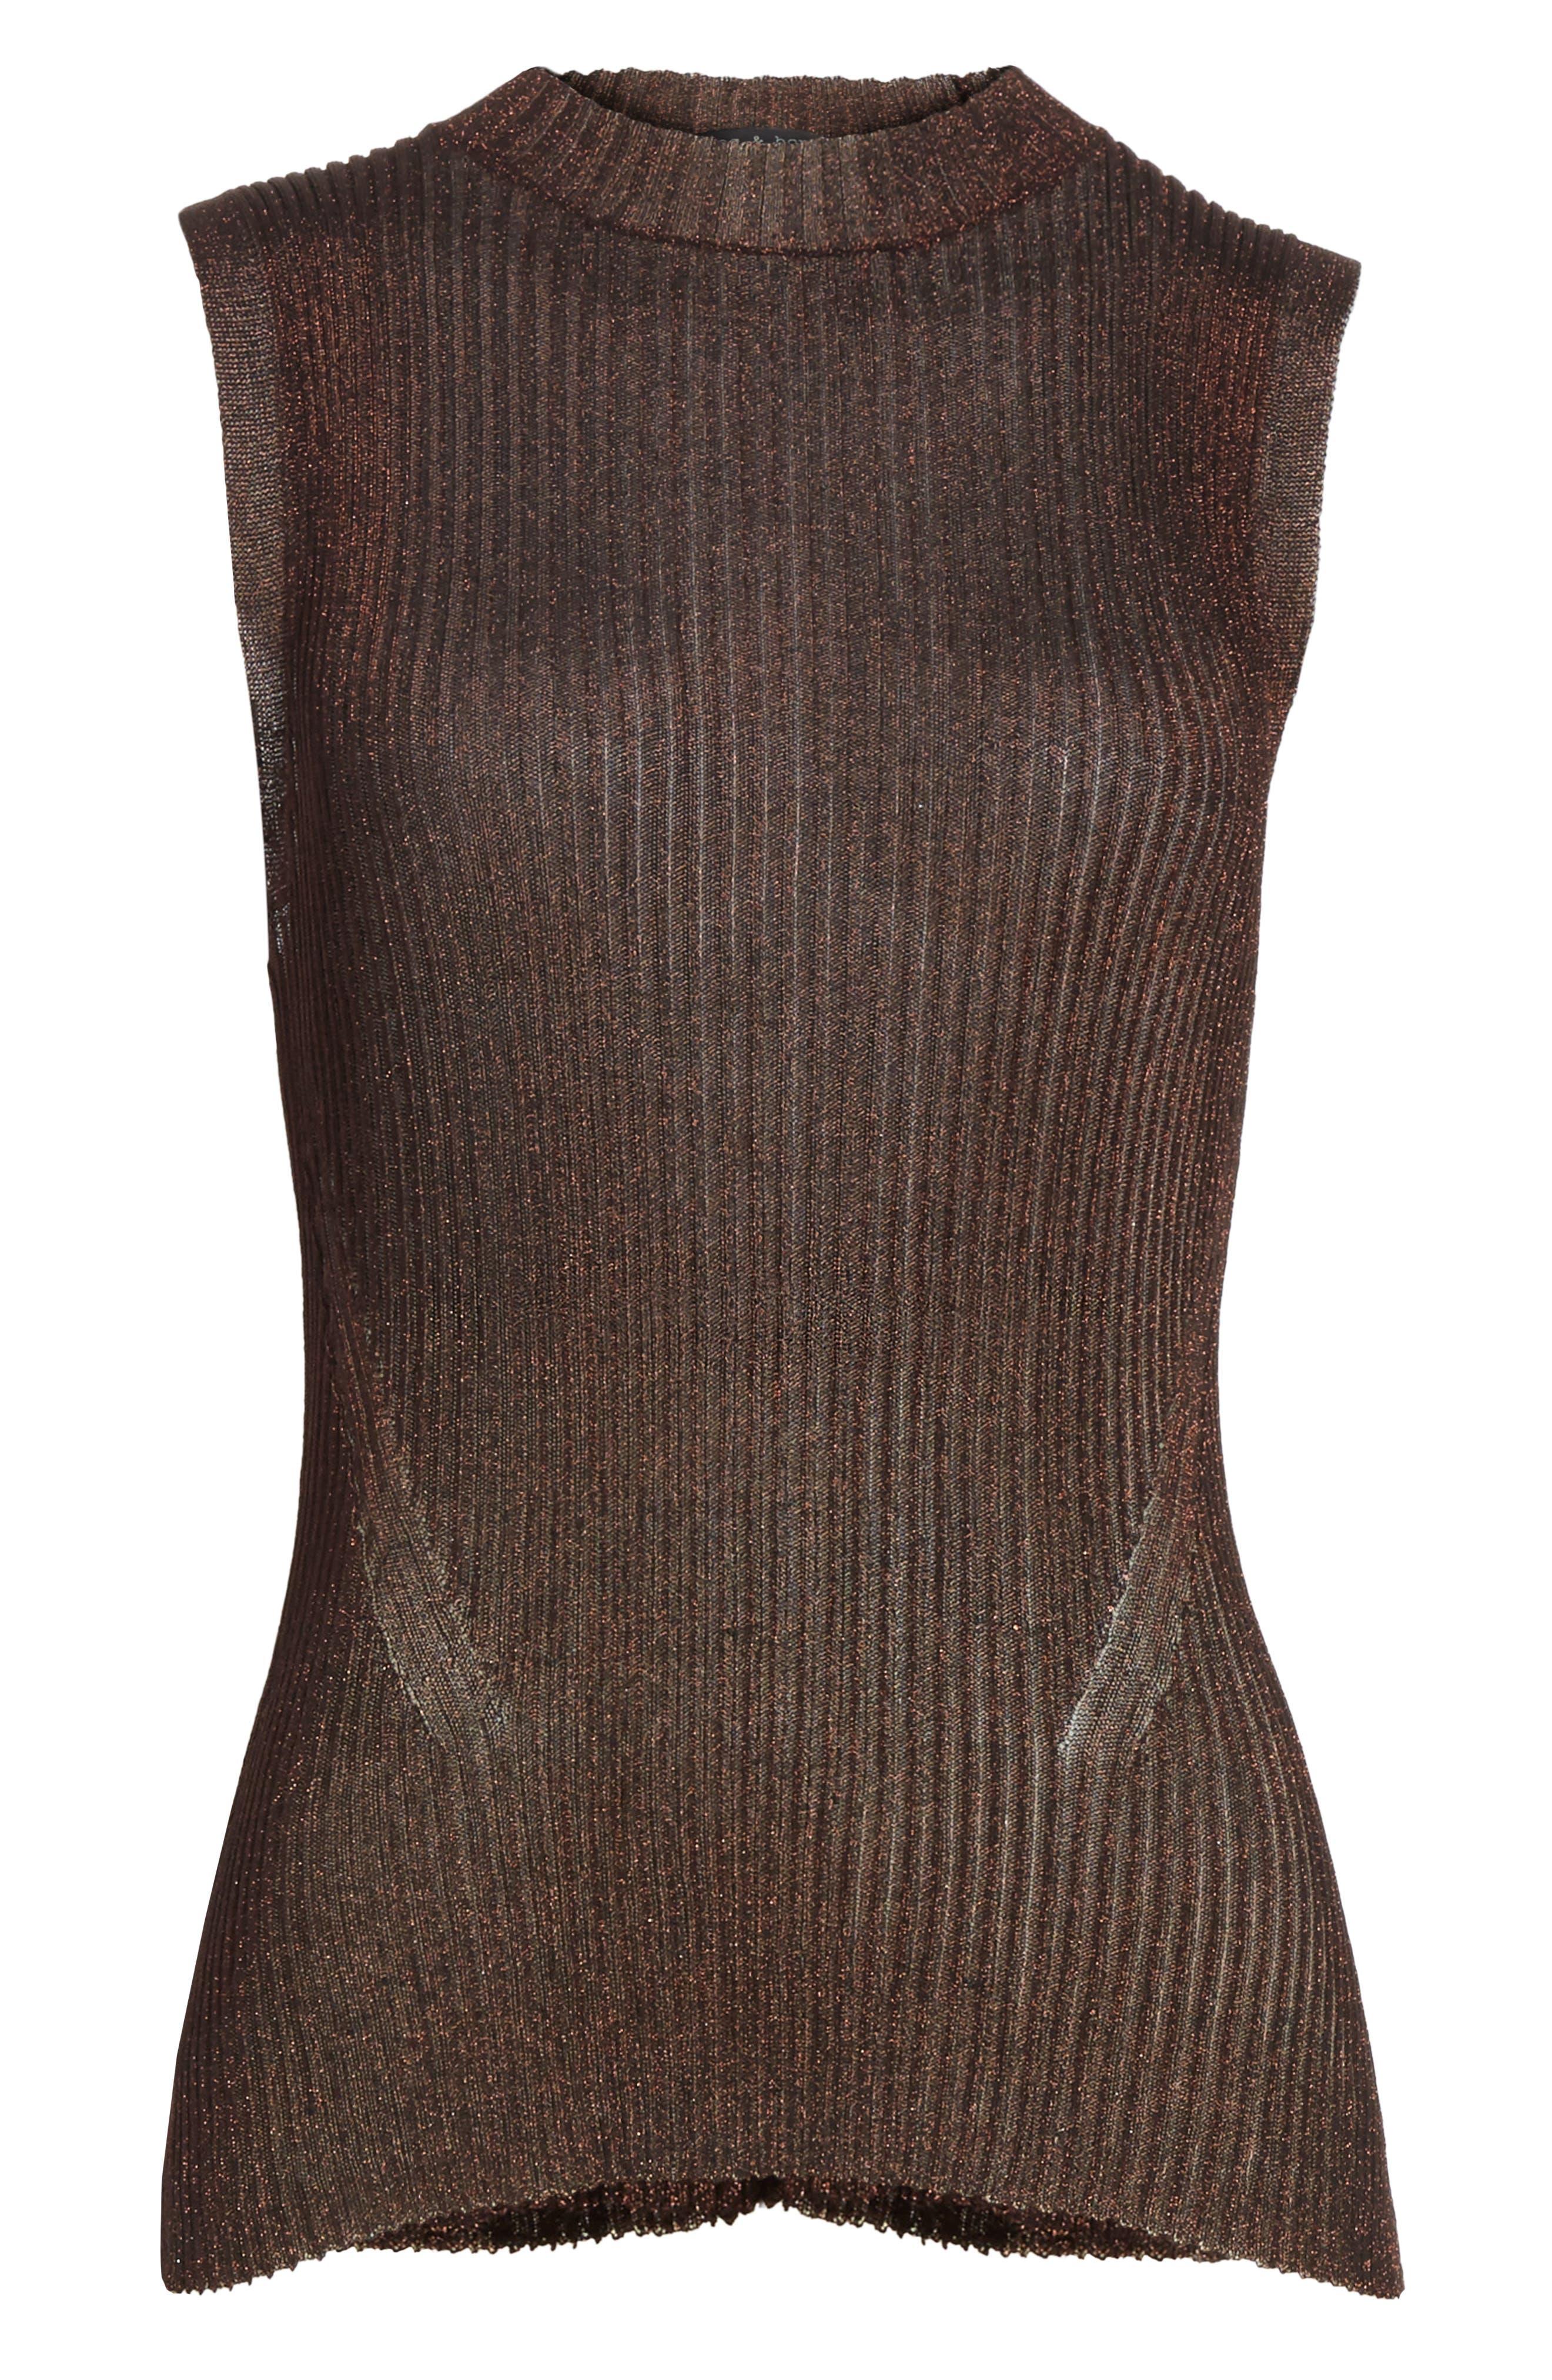 Halsey Metallic Sweater Tank,                             Alternate thumbnail 6, color,                             220